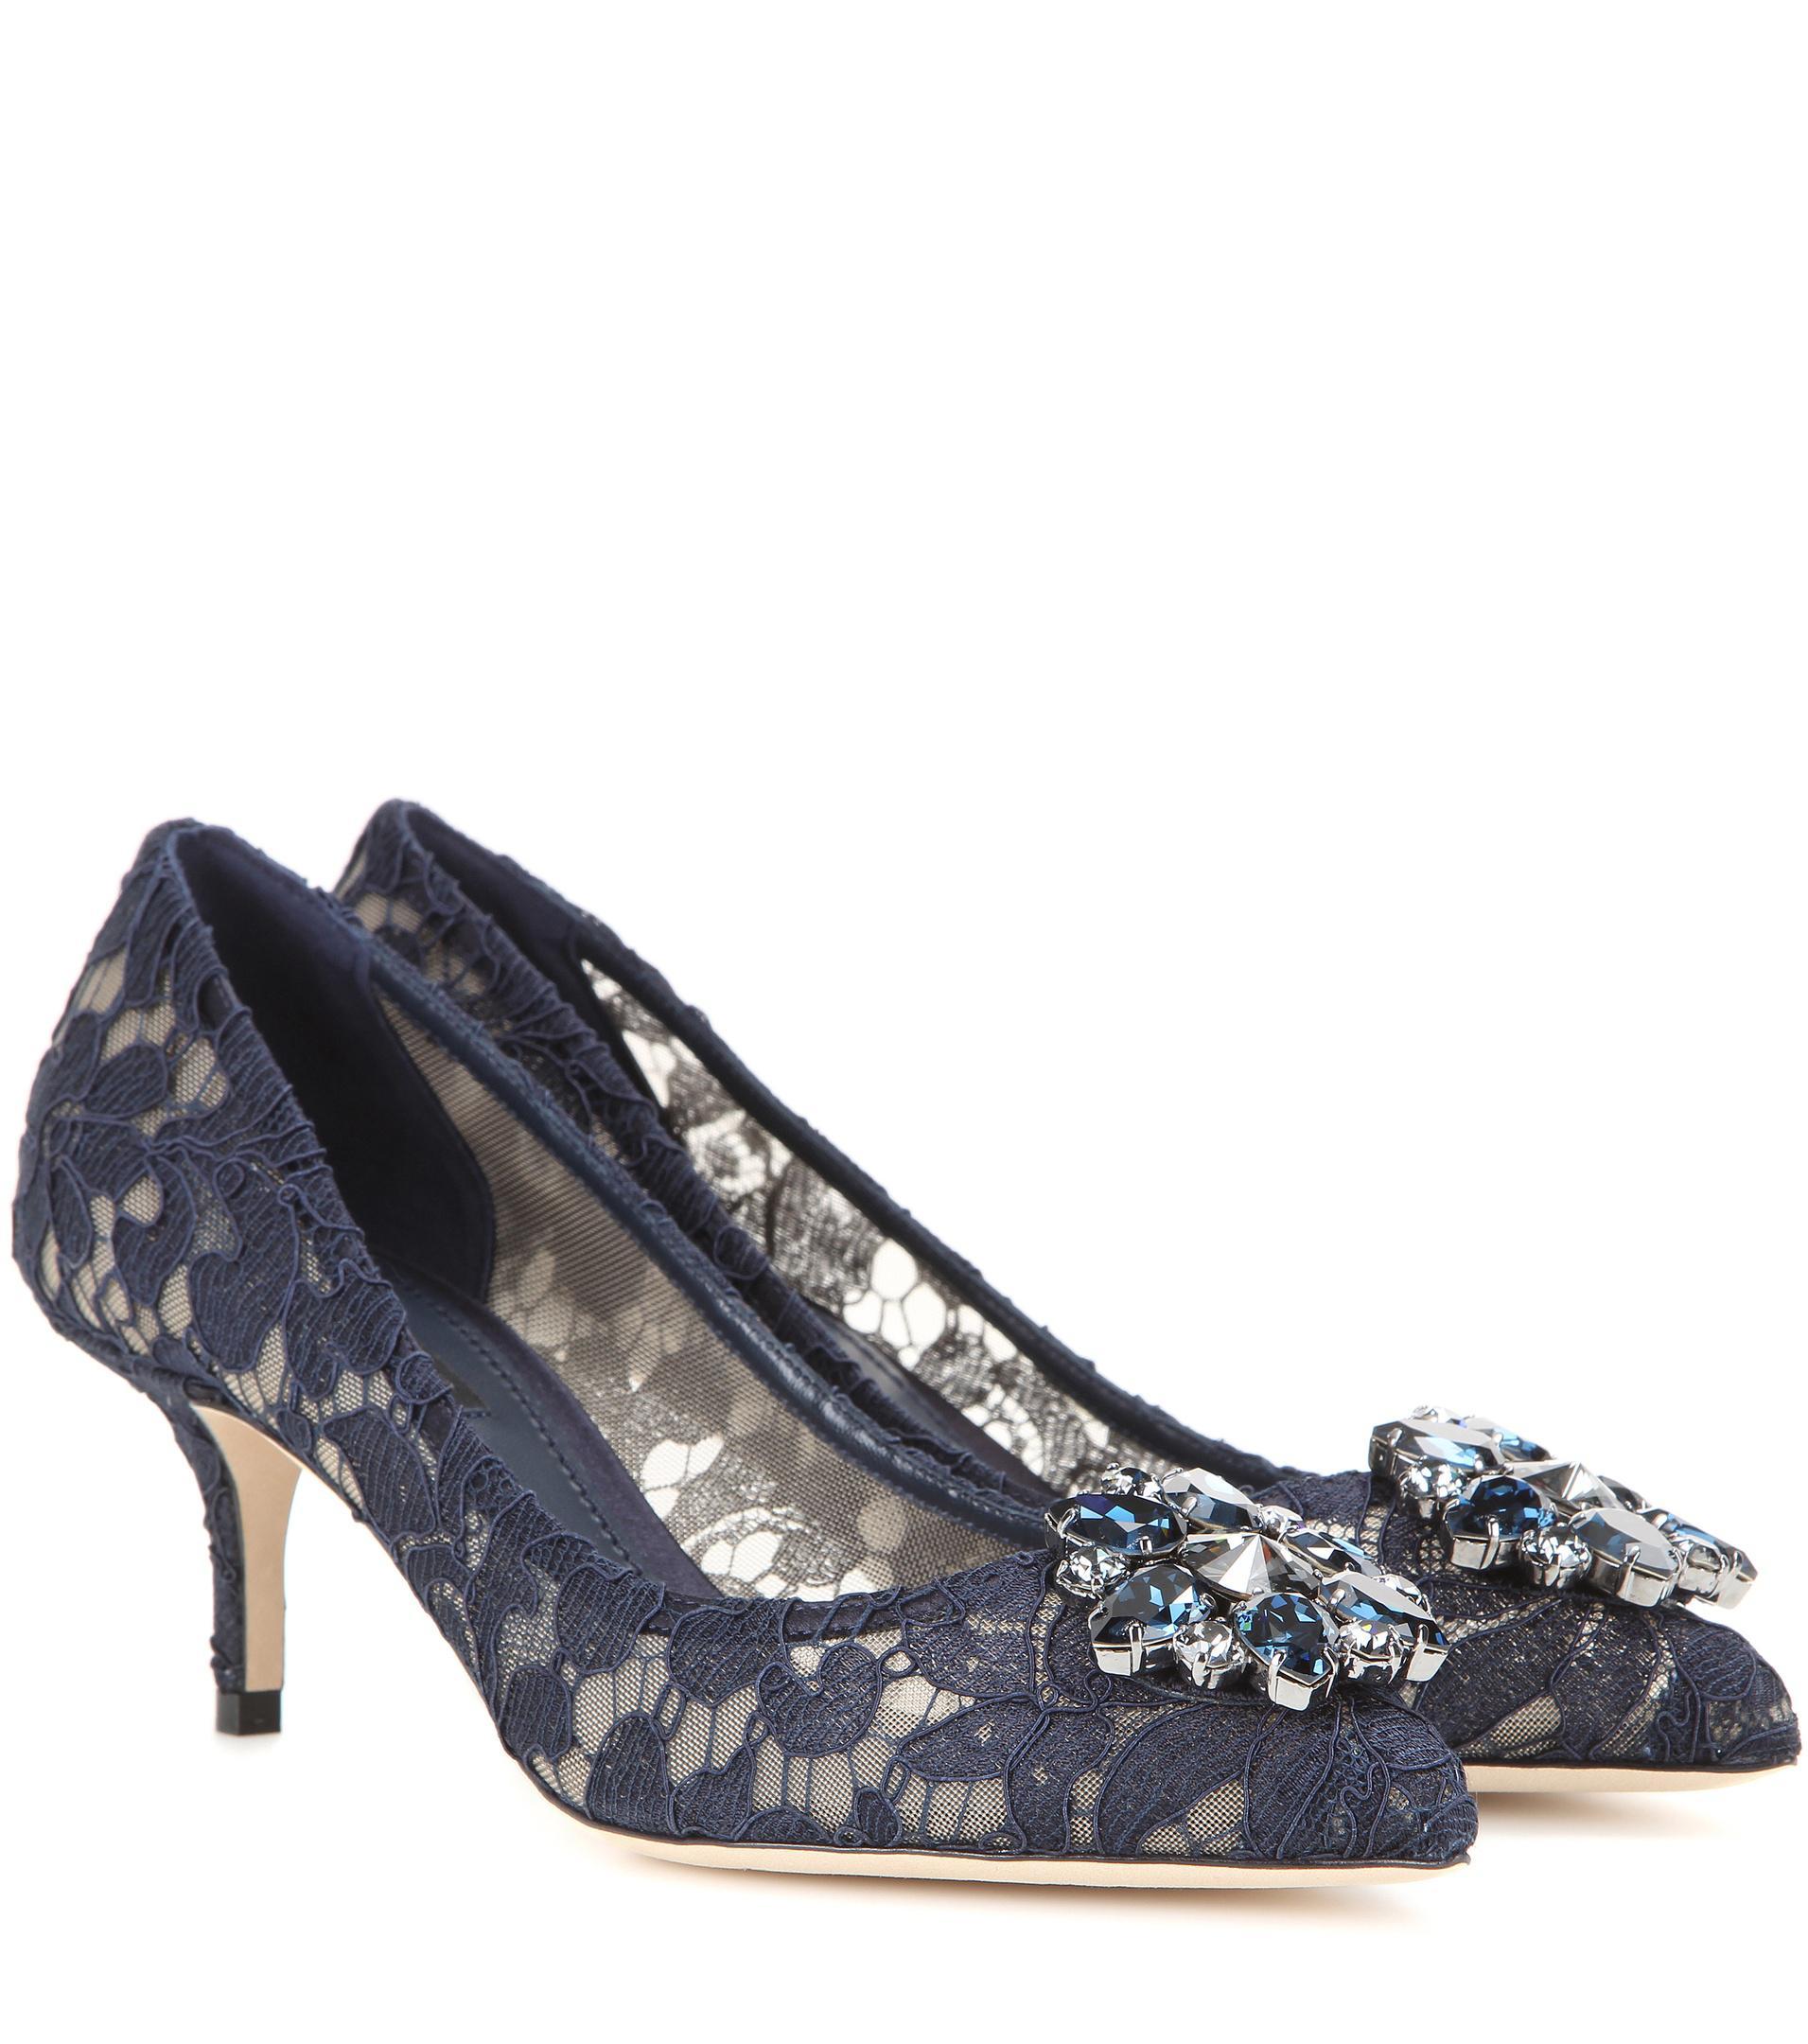 Pumps Bellucci R60 lace nylon gauze Gem black Dolce & Gabbana VhHpJf